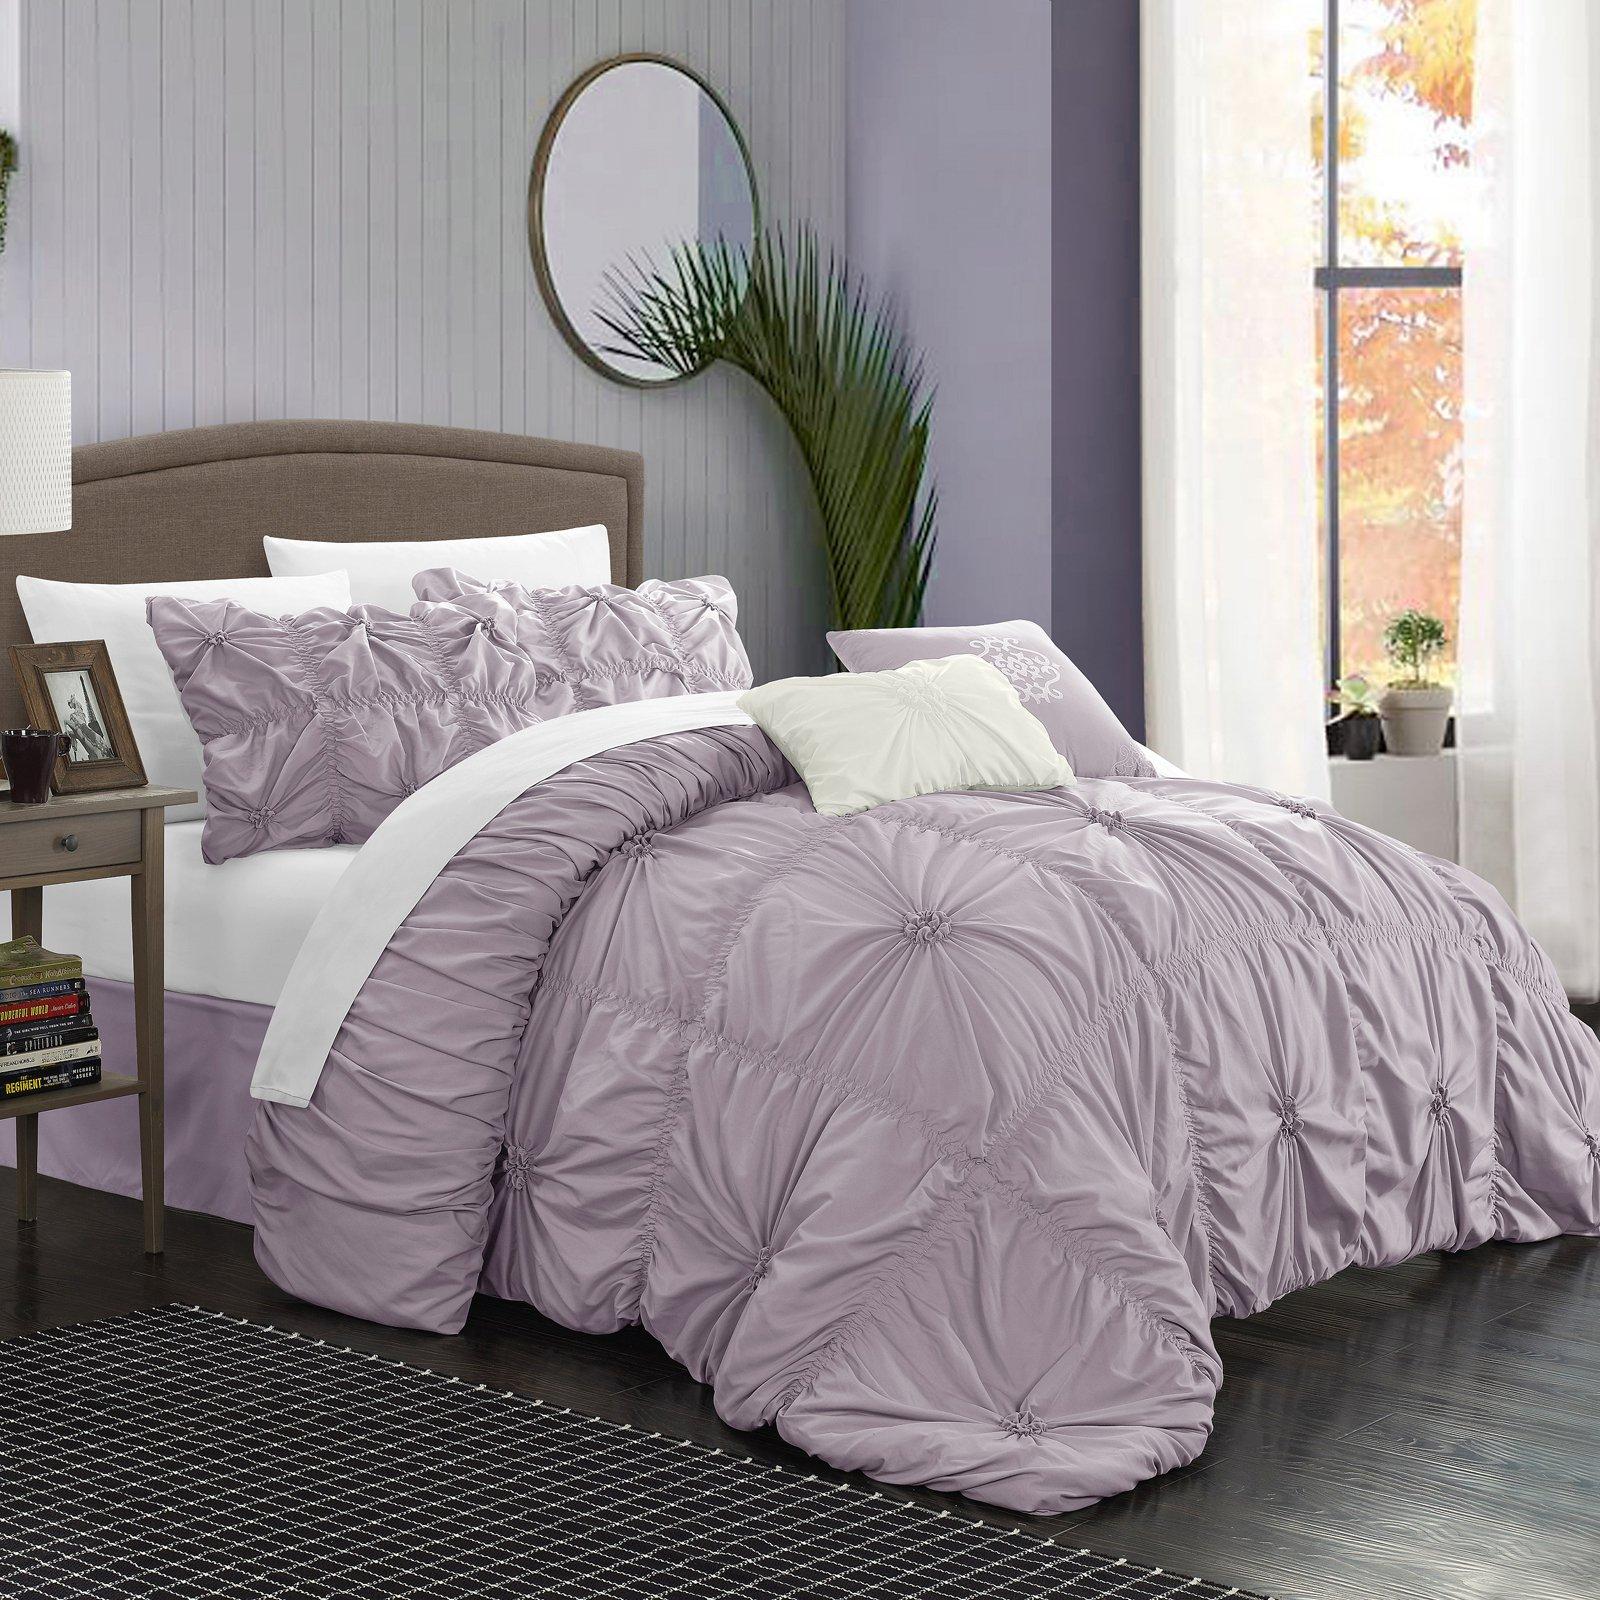 Hyatt Comforter Set By Chic Home Lavender Comforter Sets Queen